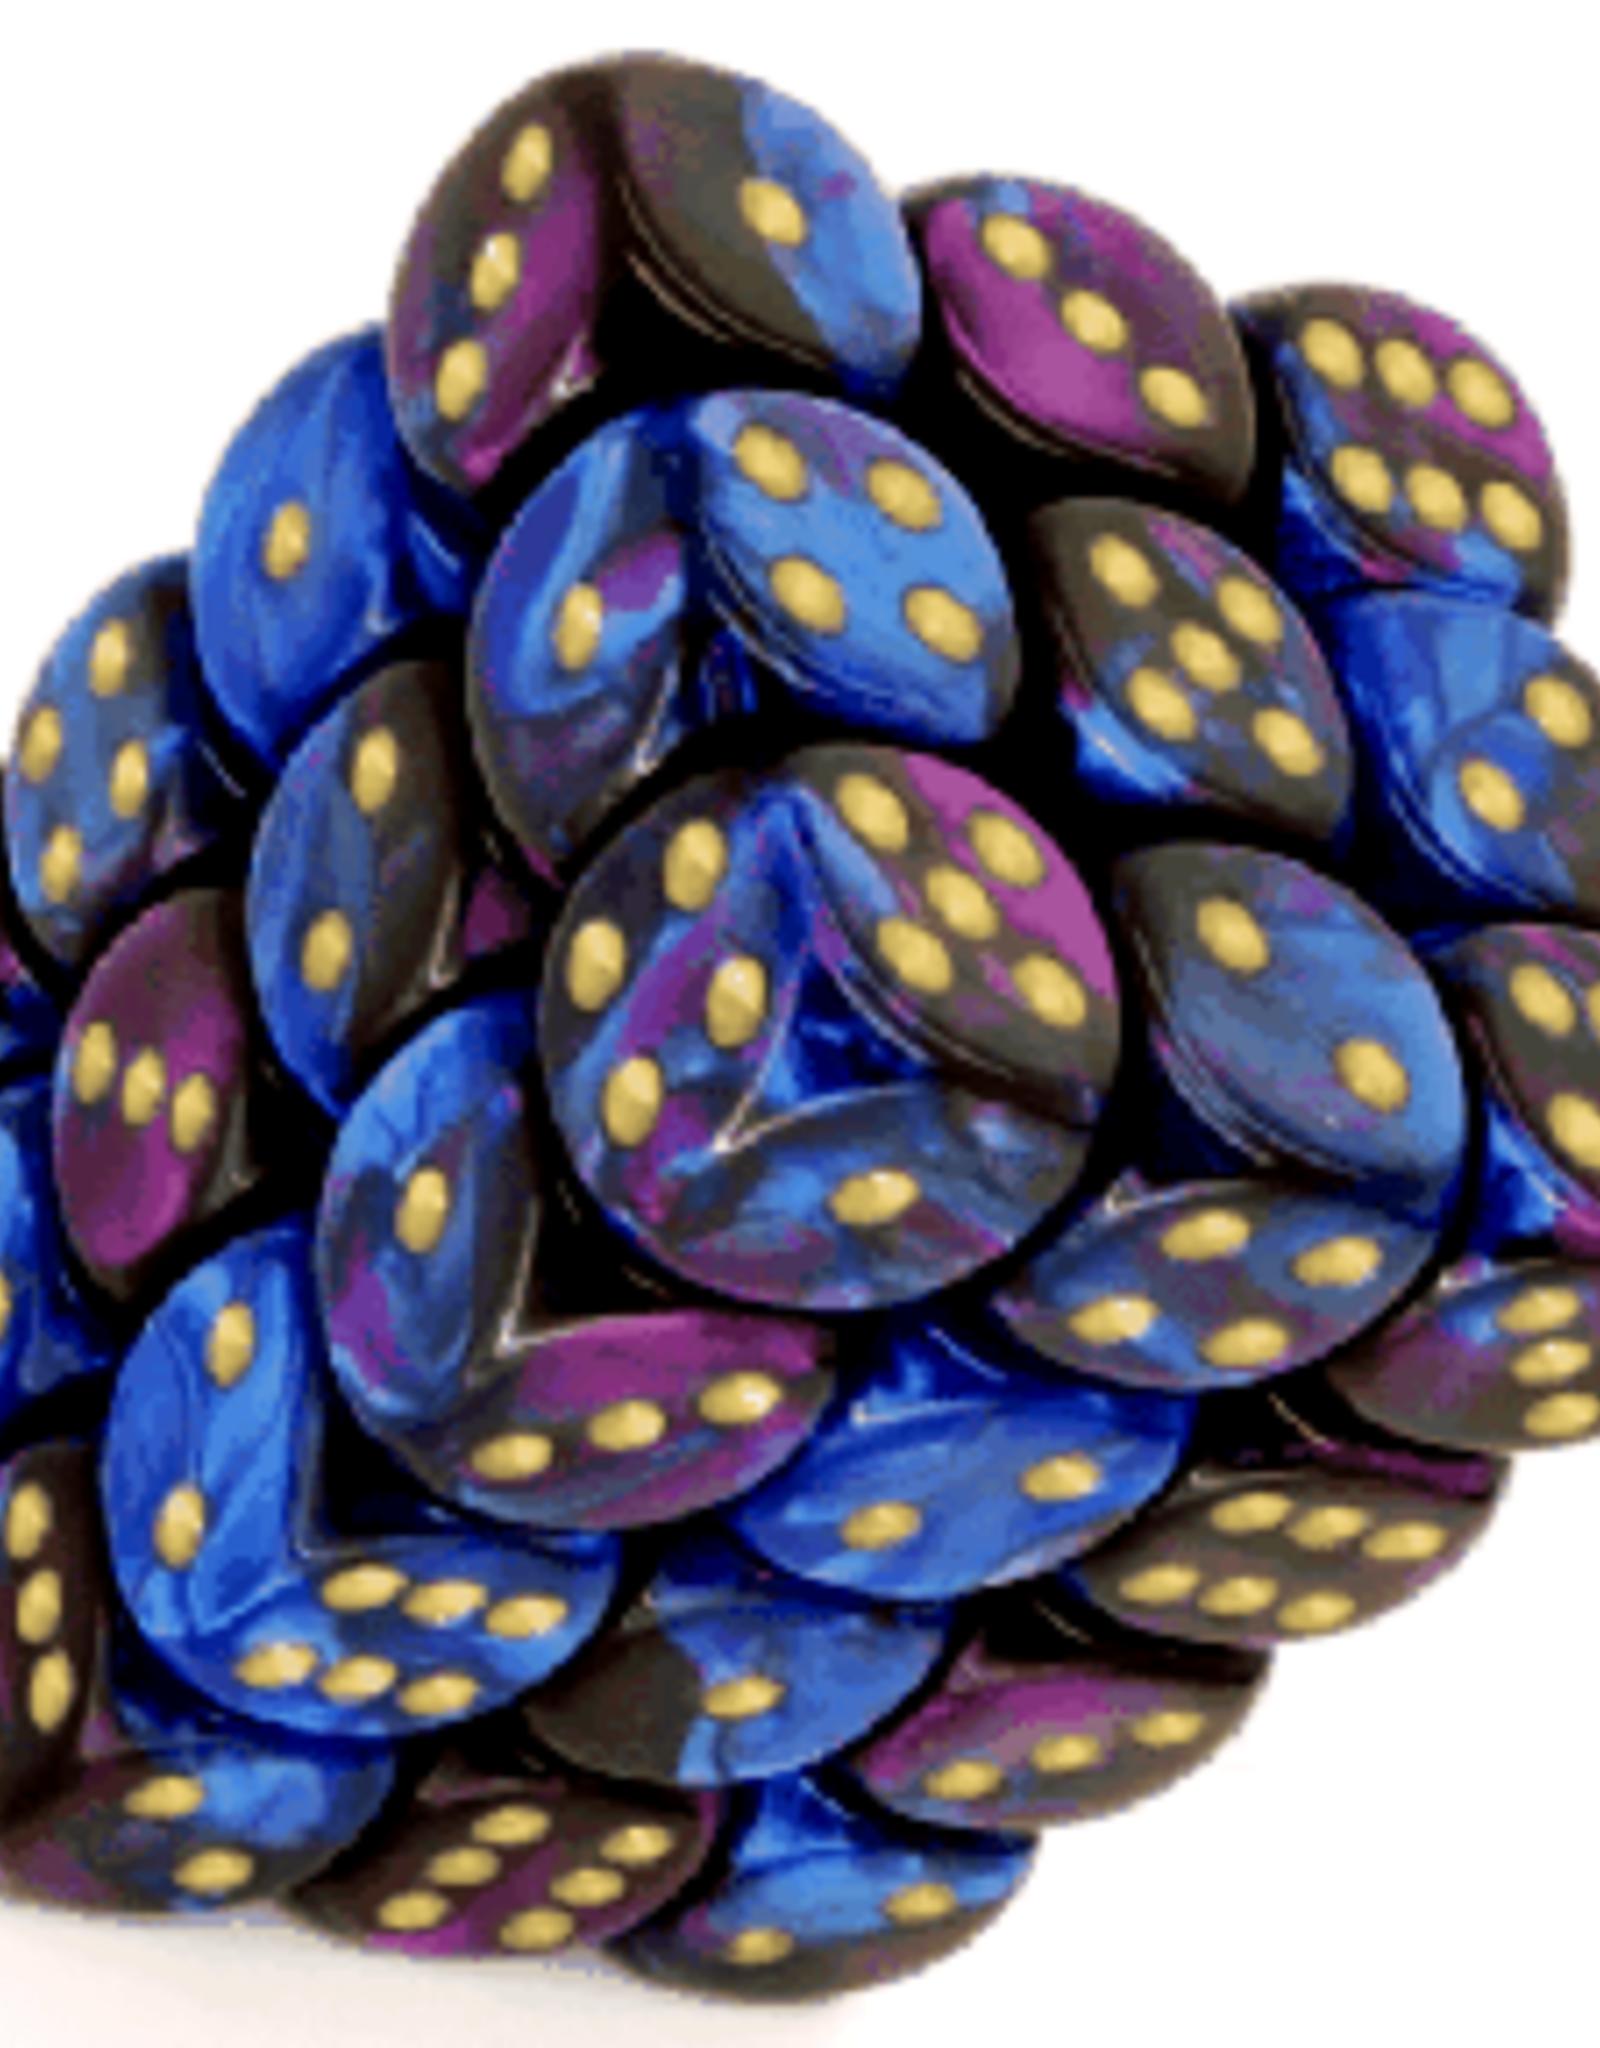 CHX 26828 GEMINI 12MM D6 - BLUE PURPLE/GOLD